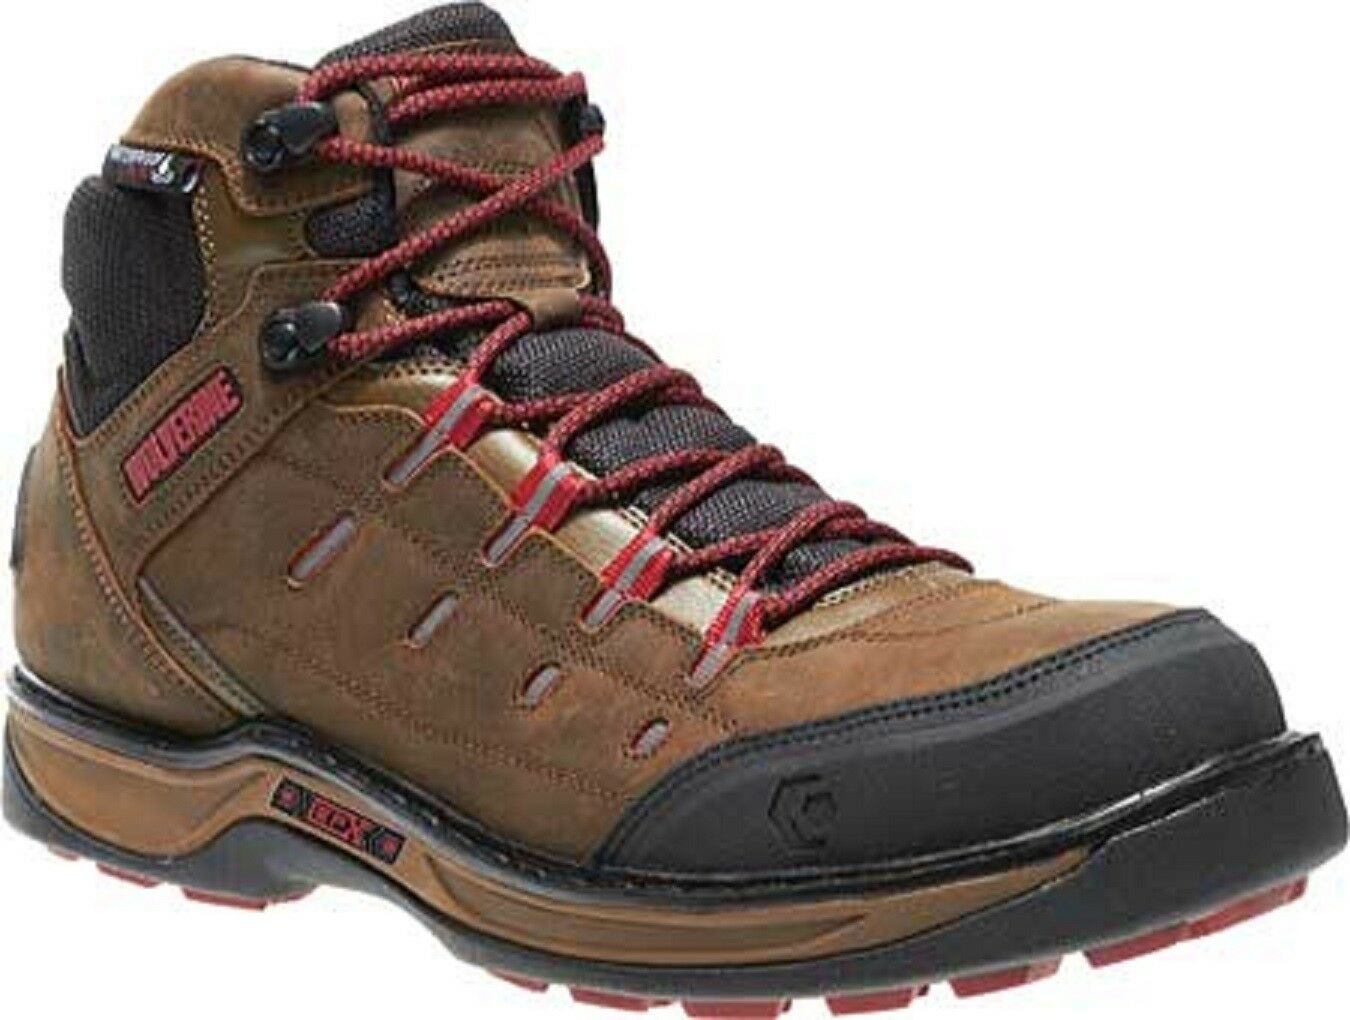 WOLVERINE W10552-M EDGE LX  Mn's (M) braun rot Nubuck Leather CT Work Stiefel